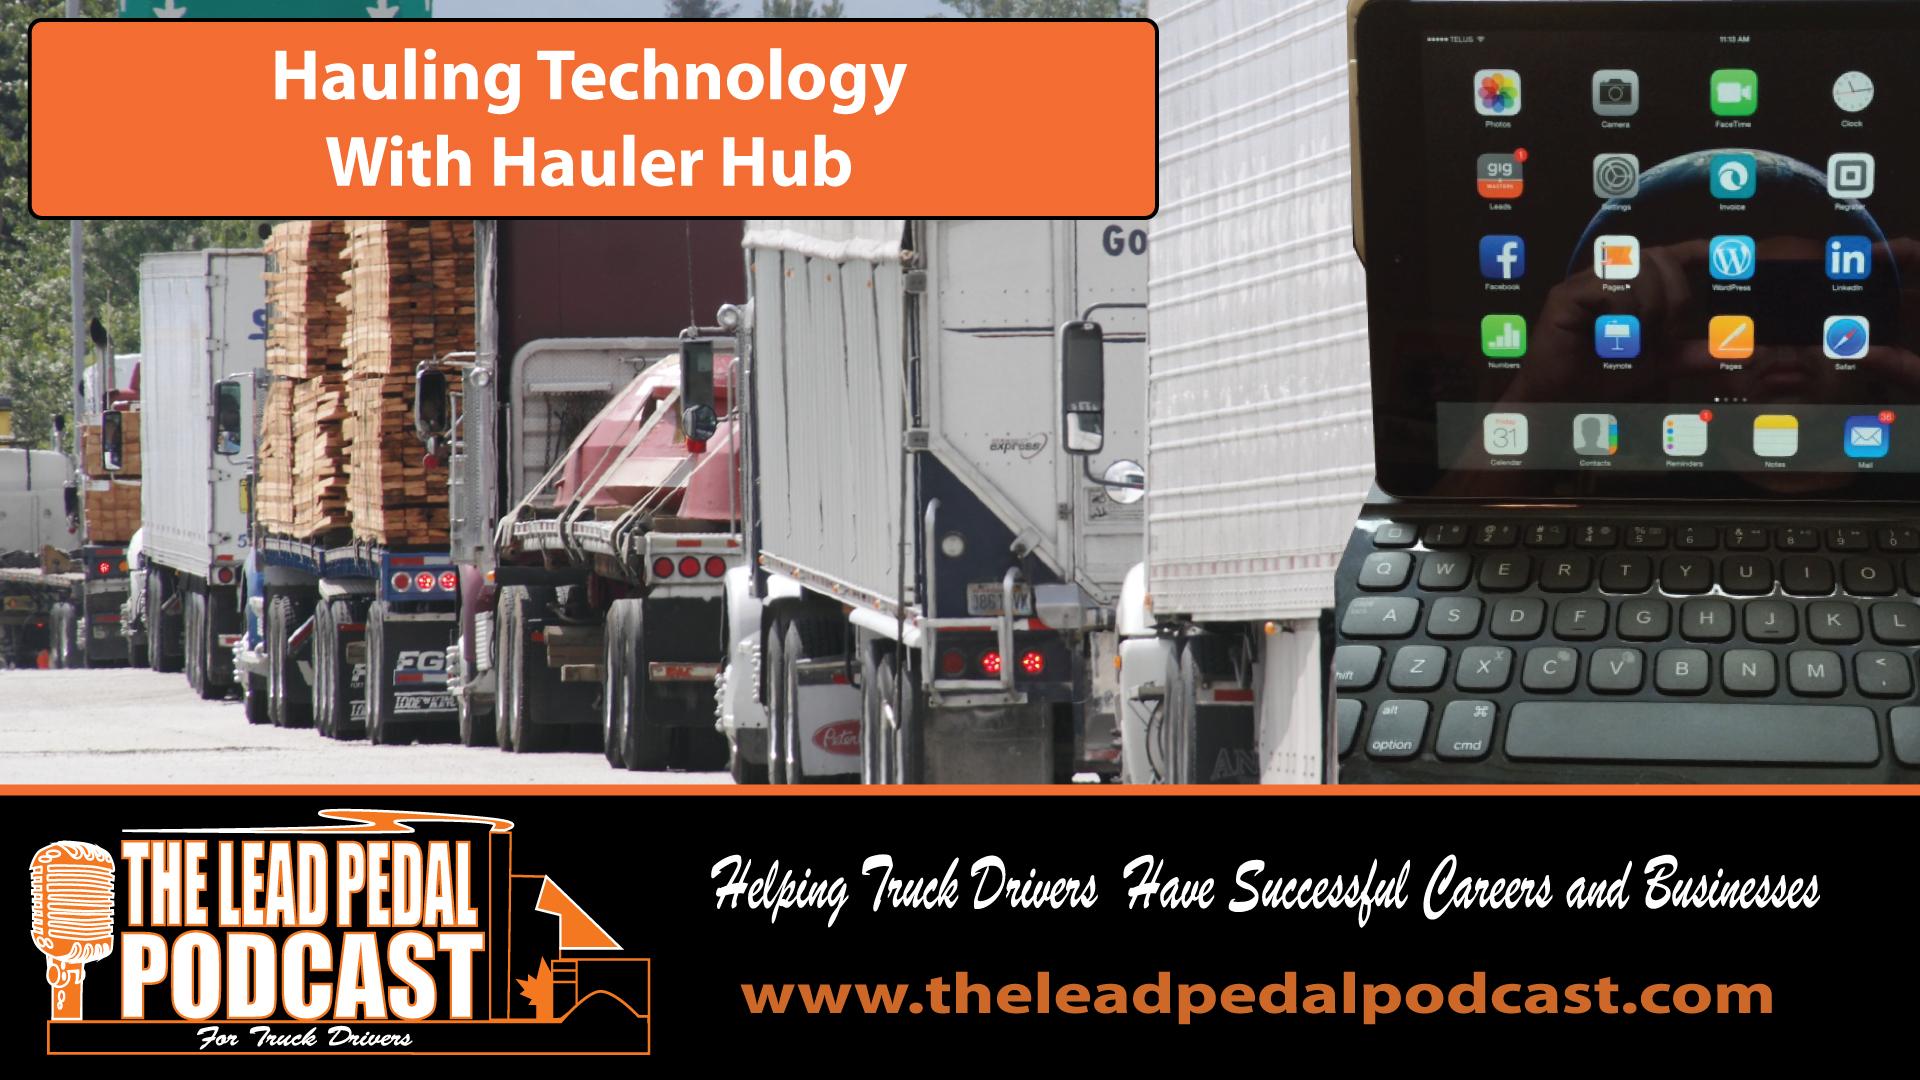 LP662 Load Technology with Hauler Hub